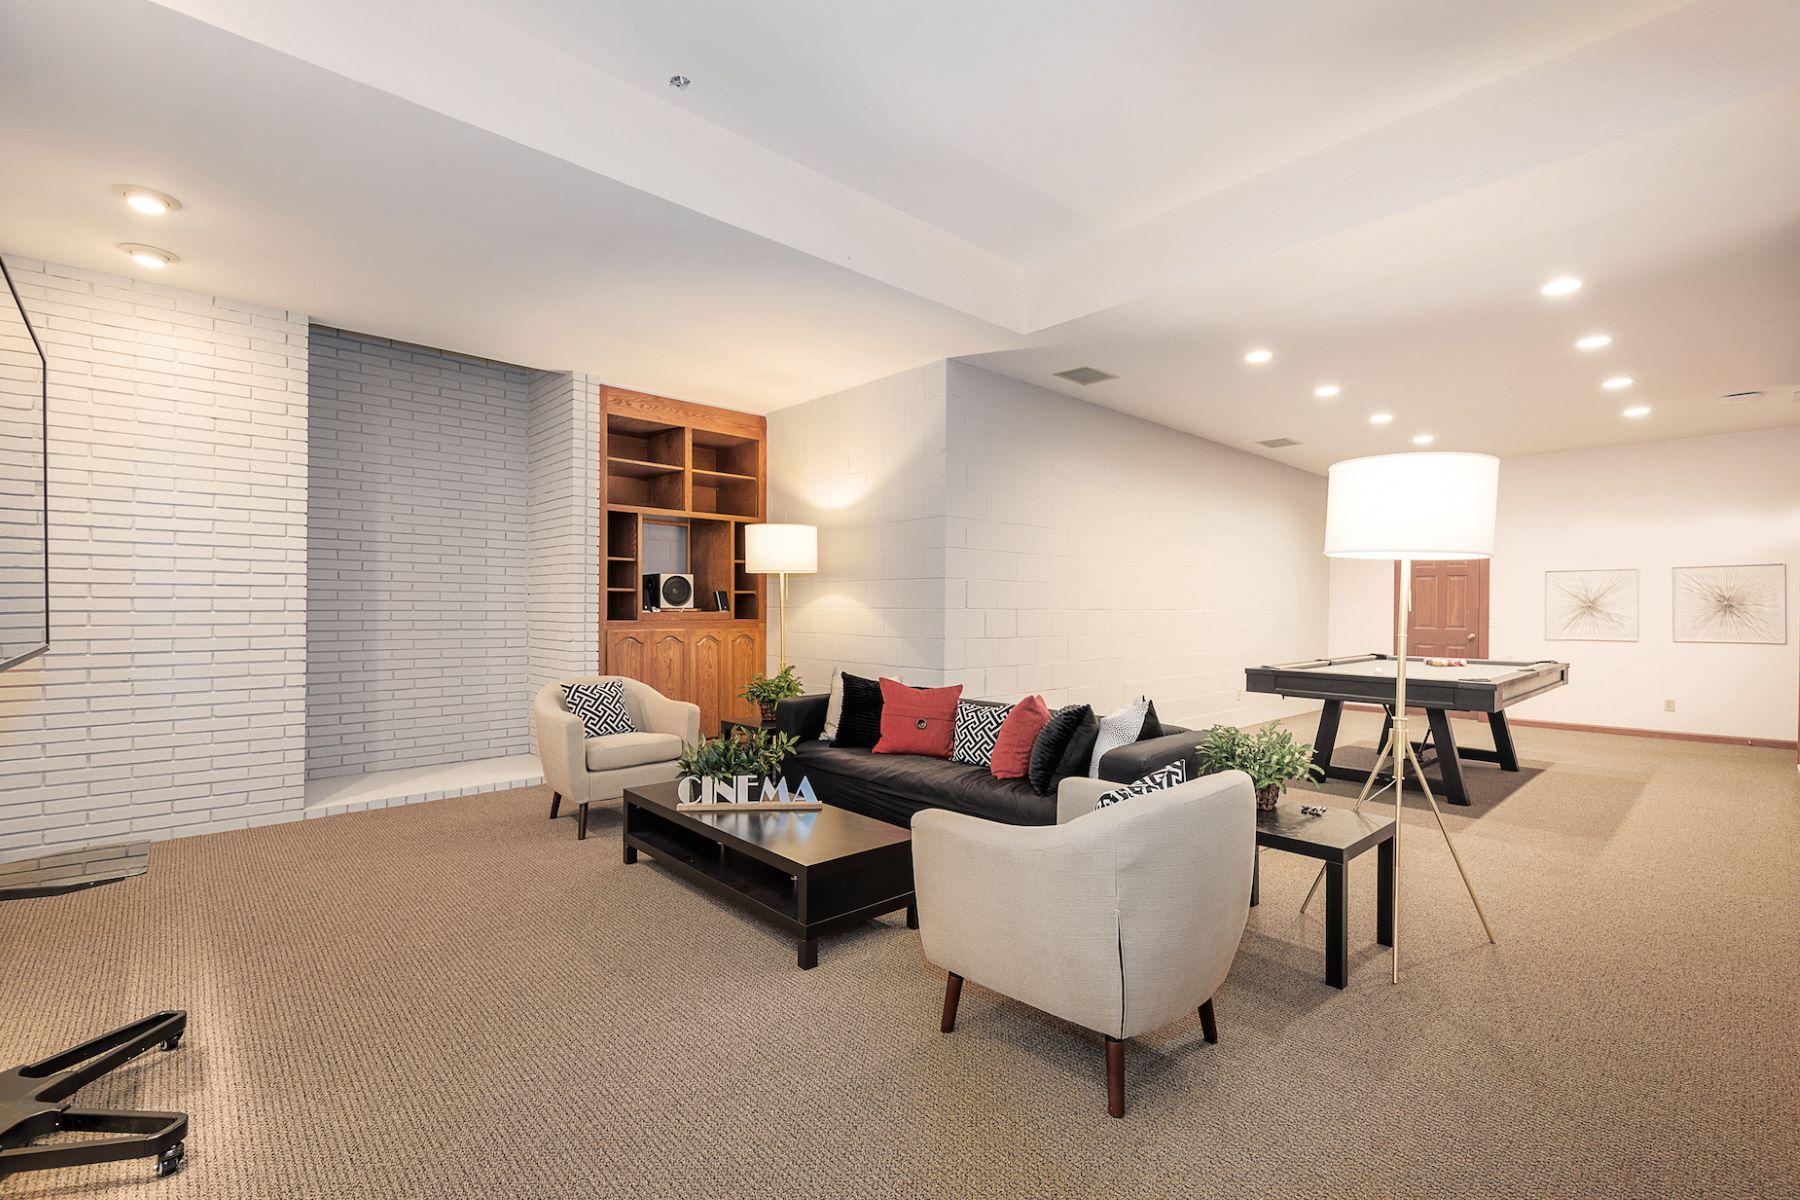 Additional photo for property listing at 1415 Kilkare Road, Sunol 1415 Kilkare Road Sunol, California 94586 United States